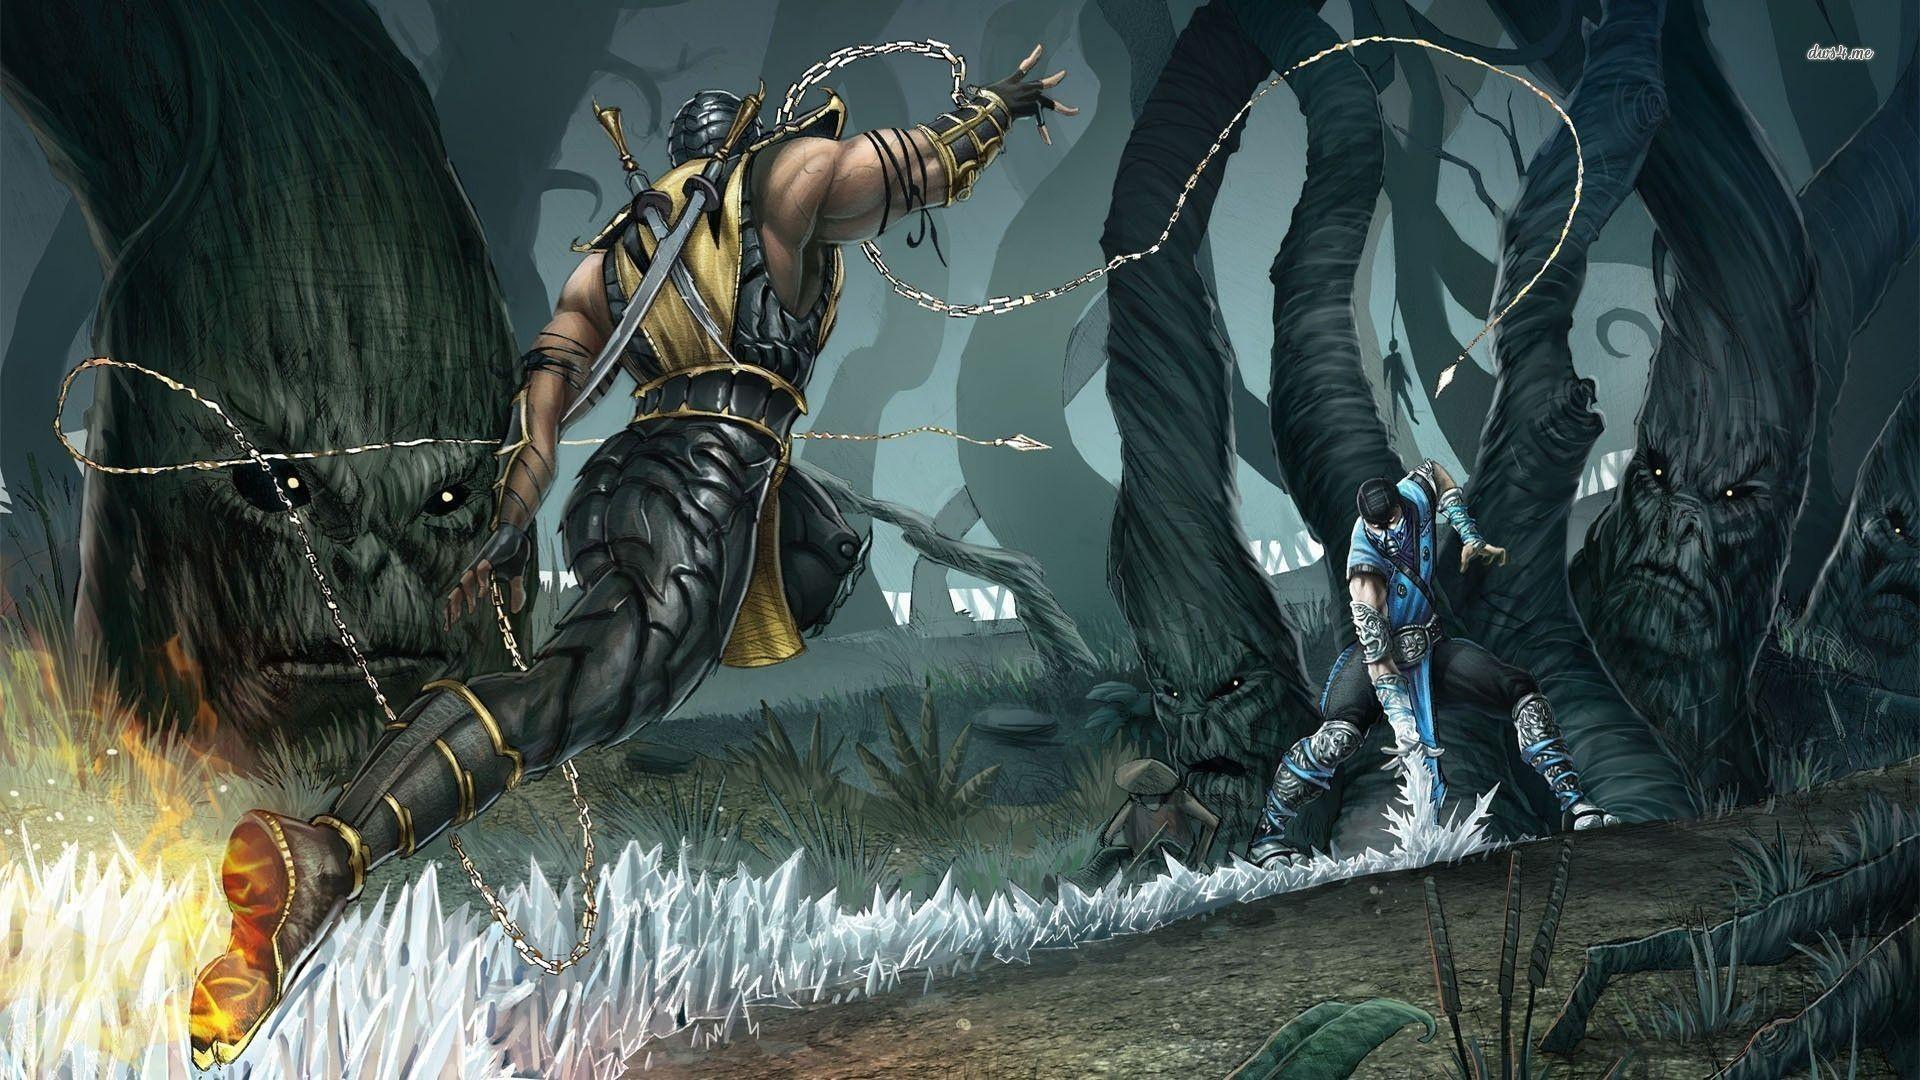 Scorpion vs Sub-Zero – Mortal Kombat wallpaper – Game wallpapers .